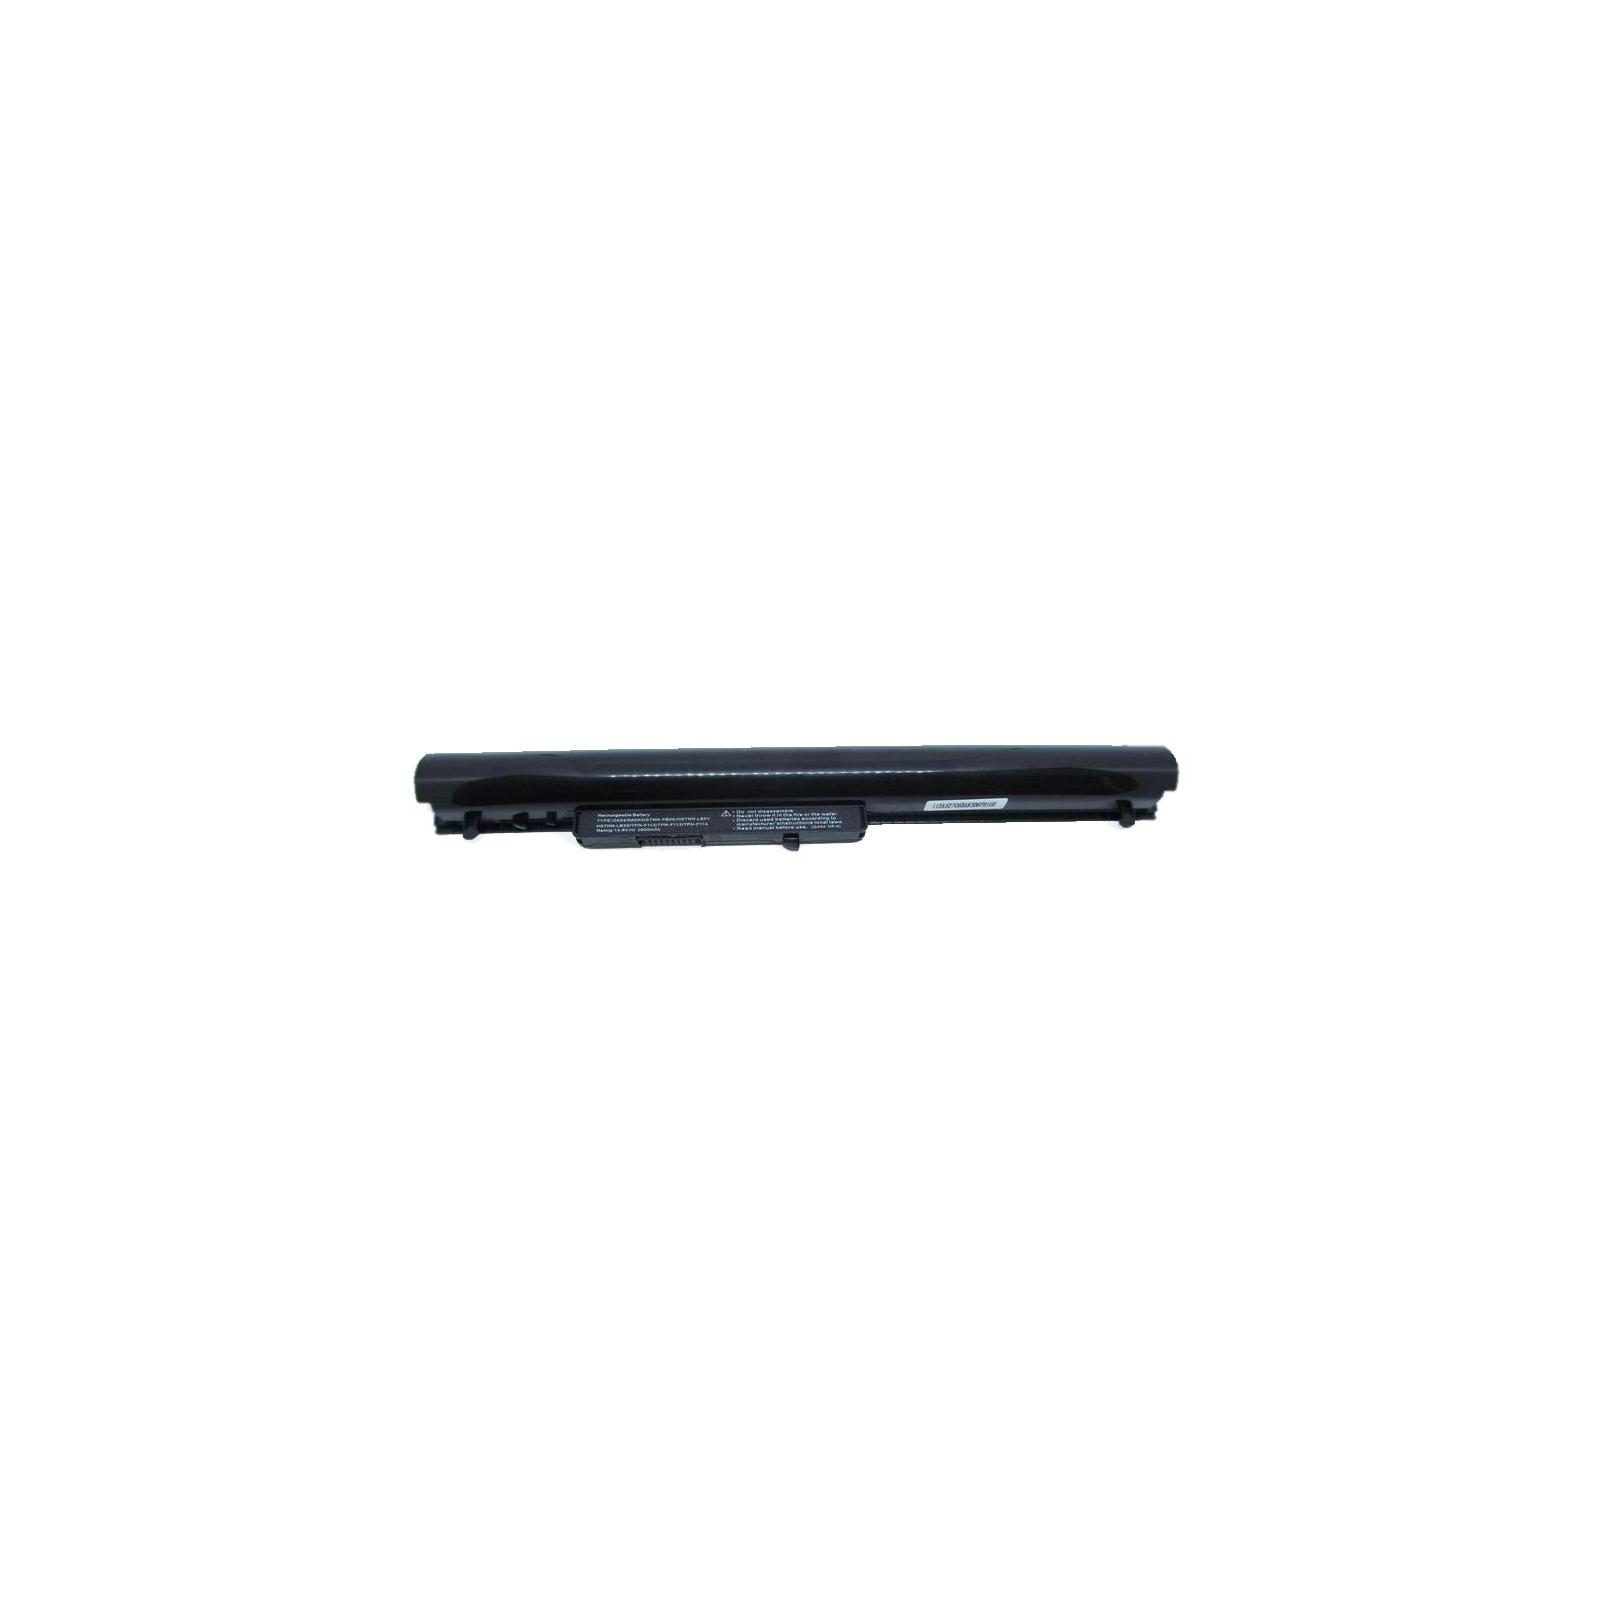 Аккумулятор для ноутбука HP 240 G2 HSTNN-LB5S, 2600mAh, 4cell, 14.8V, Li-ion (A47238)